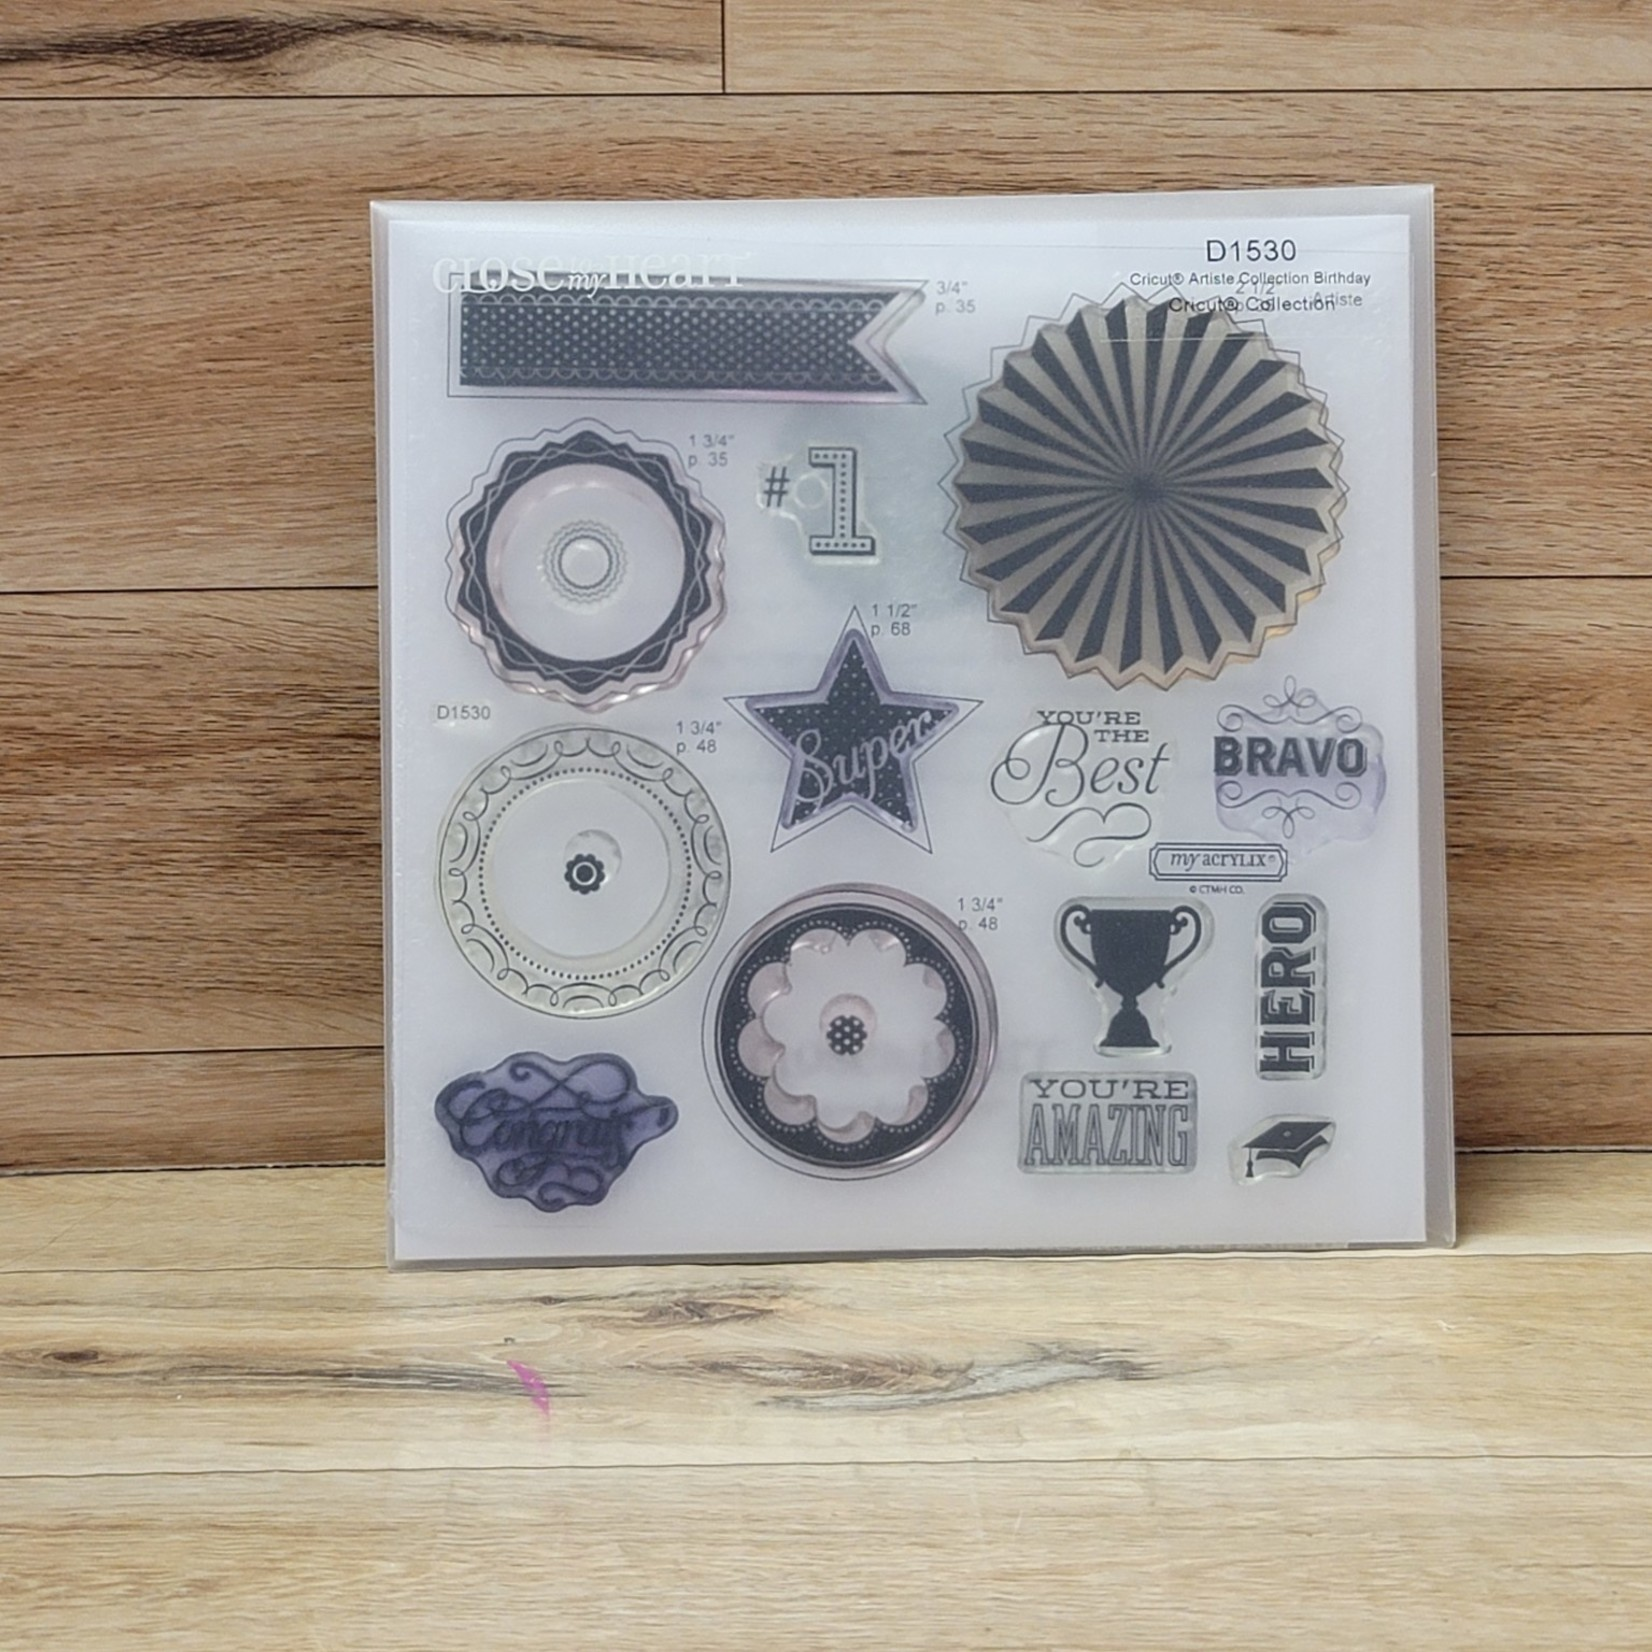 Close to my Heart - My Acrylix - Cricut Artiste Collection Birthday